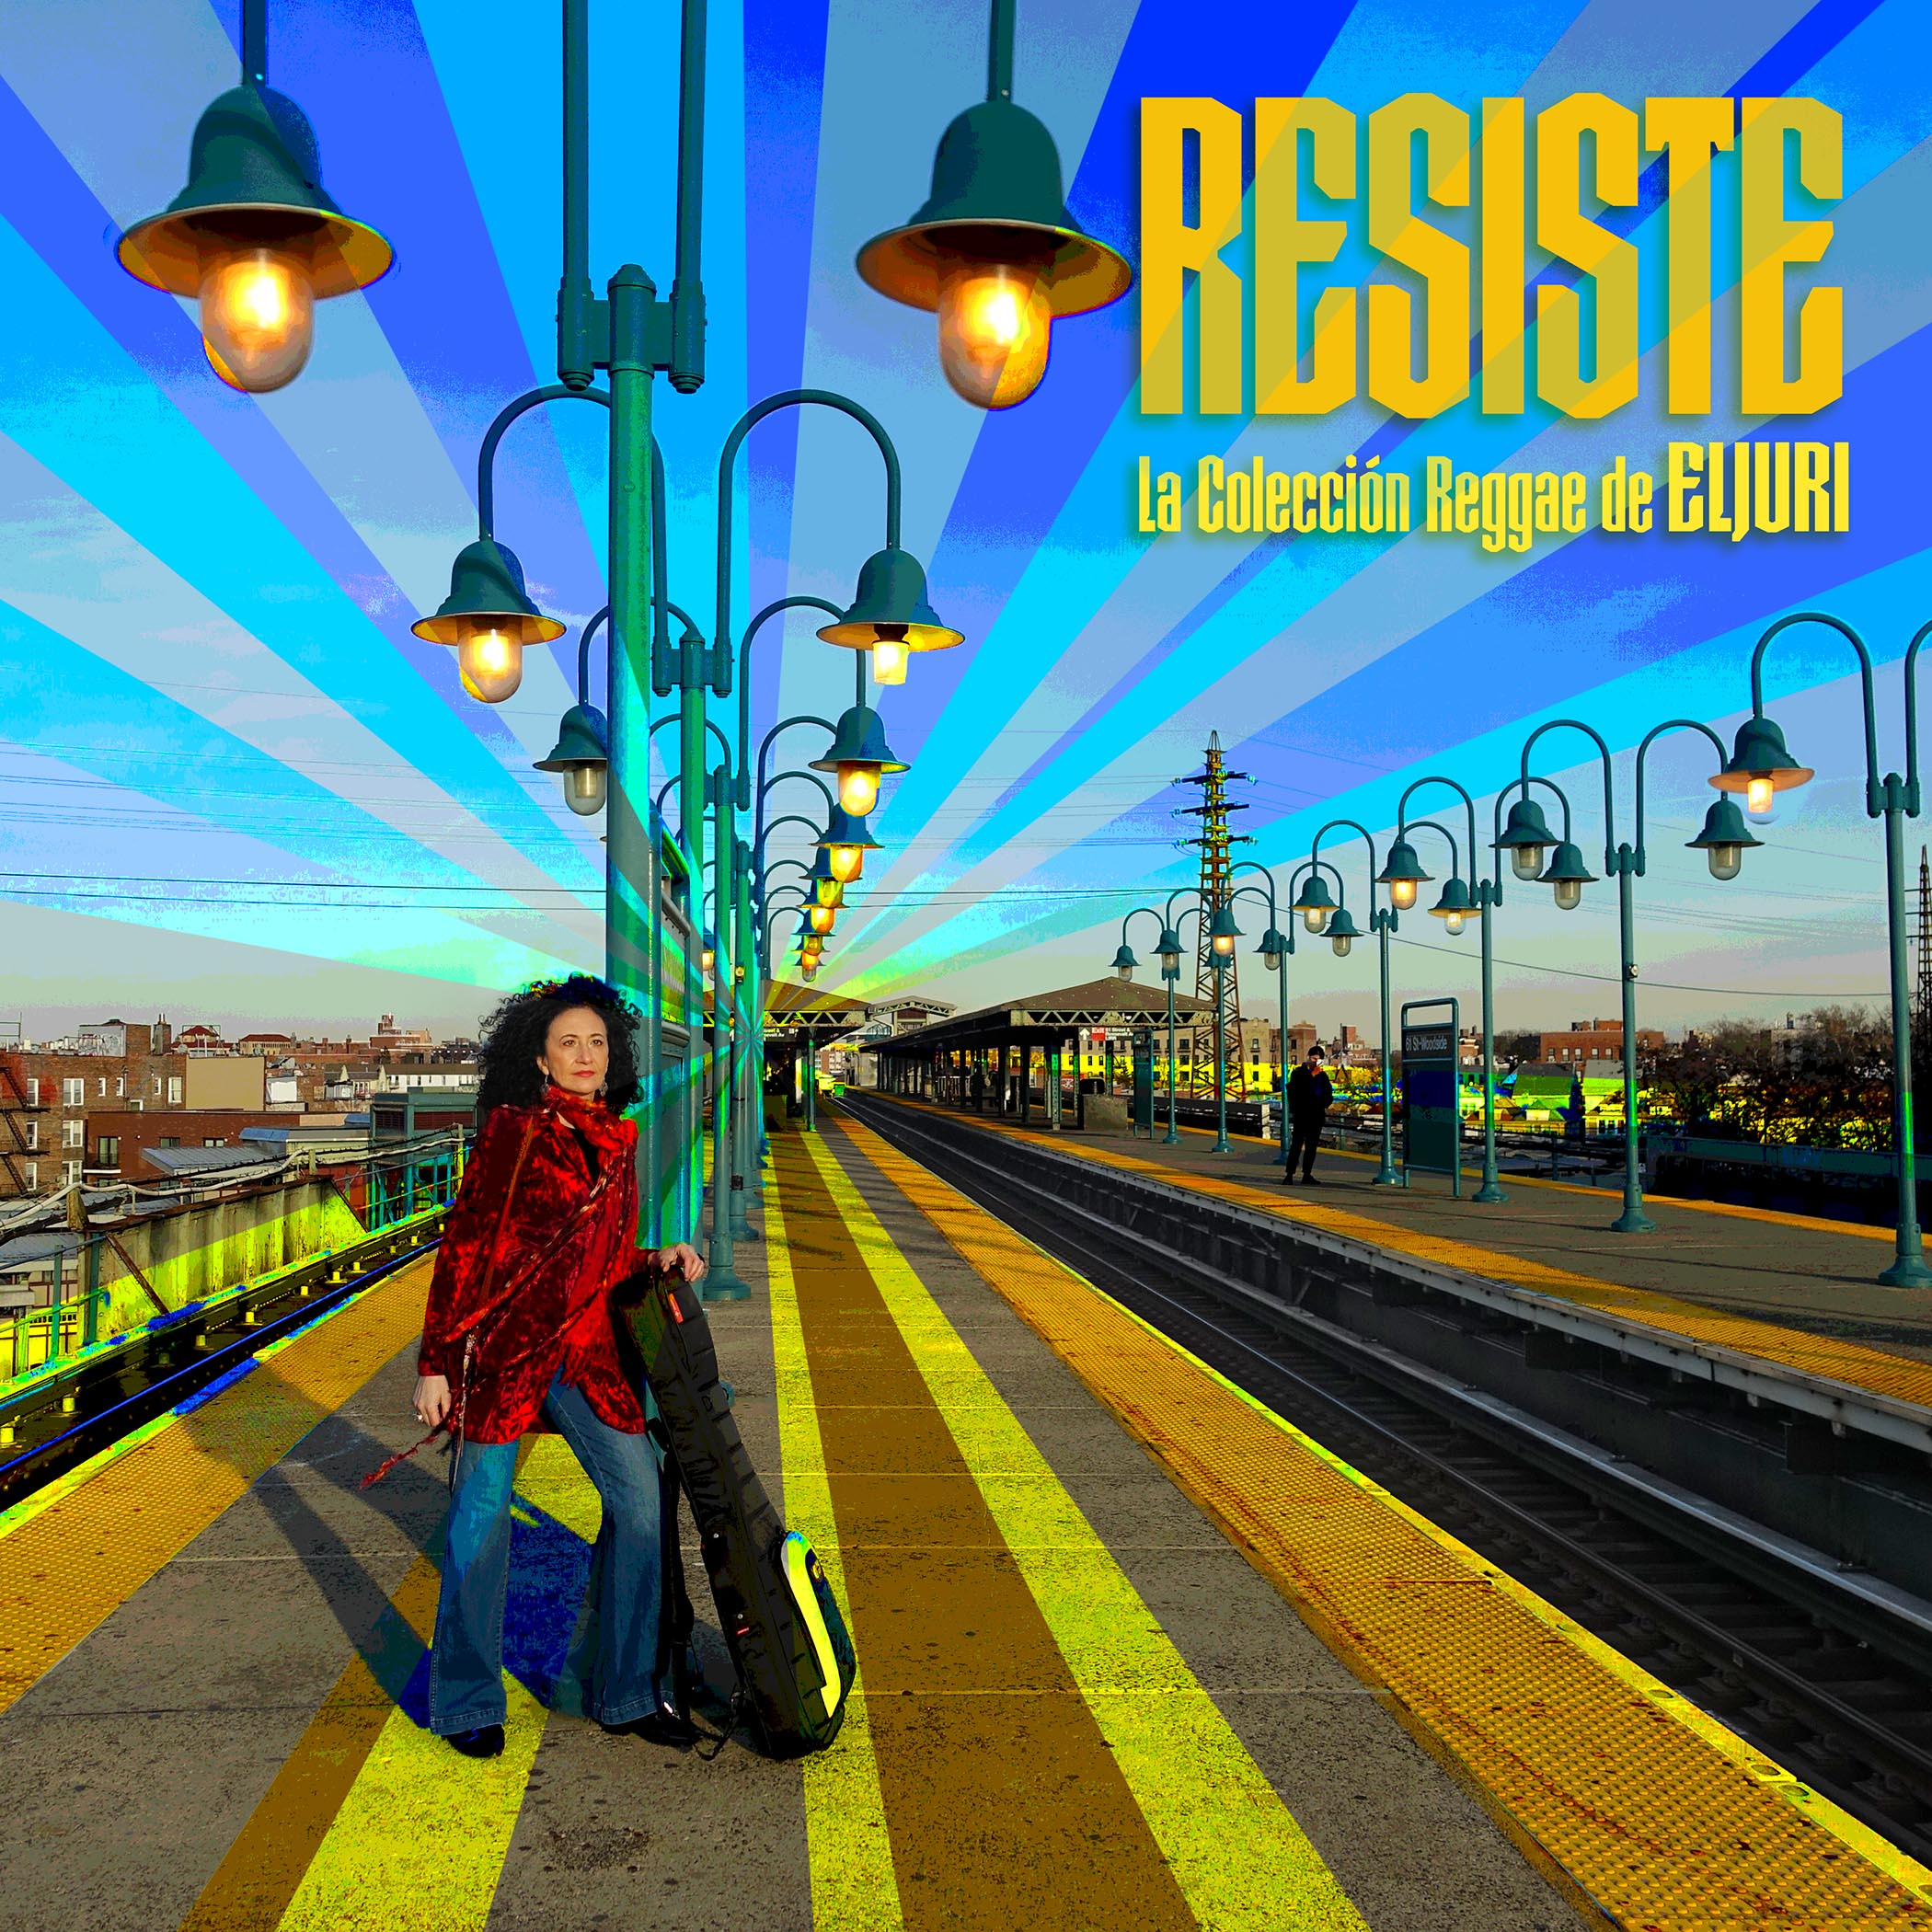 Eljuri-Resiste-2019.jpg